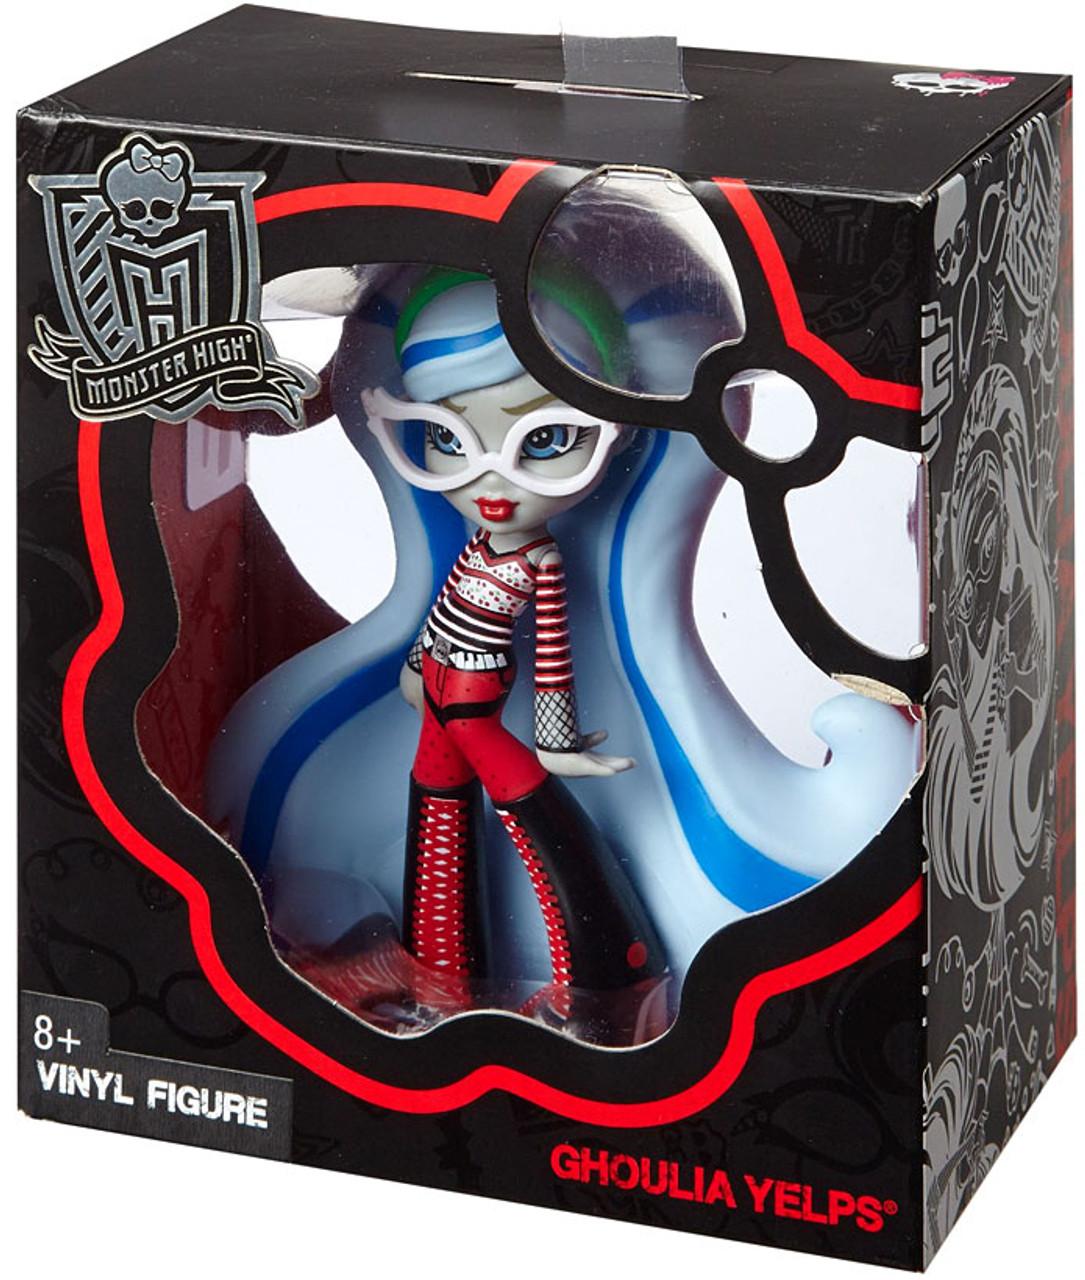 monster high ghoulia yelps vinyl figure - Ghoulia Yelps